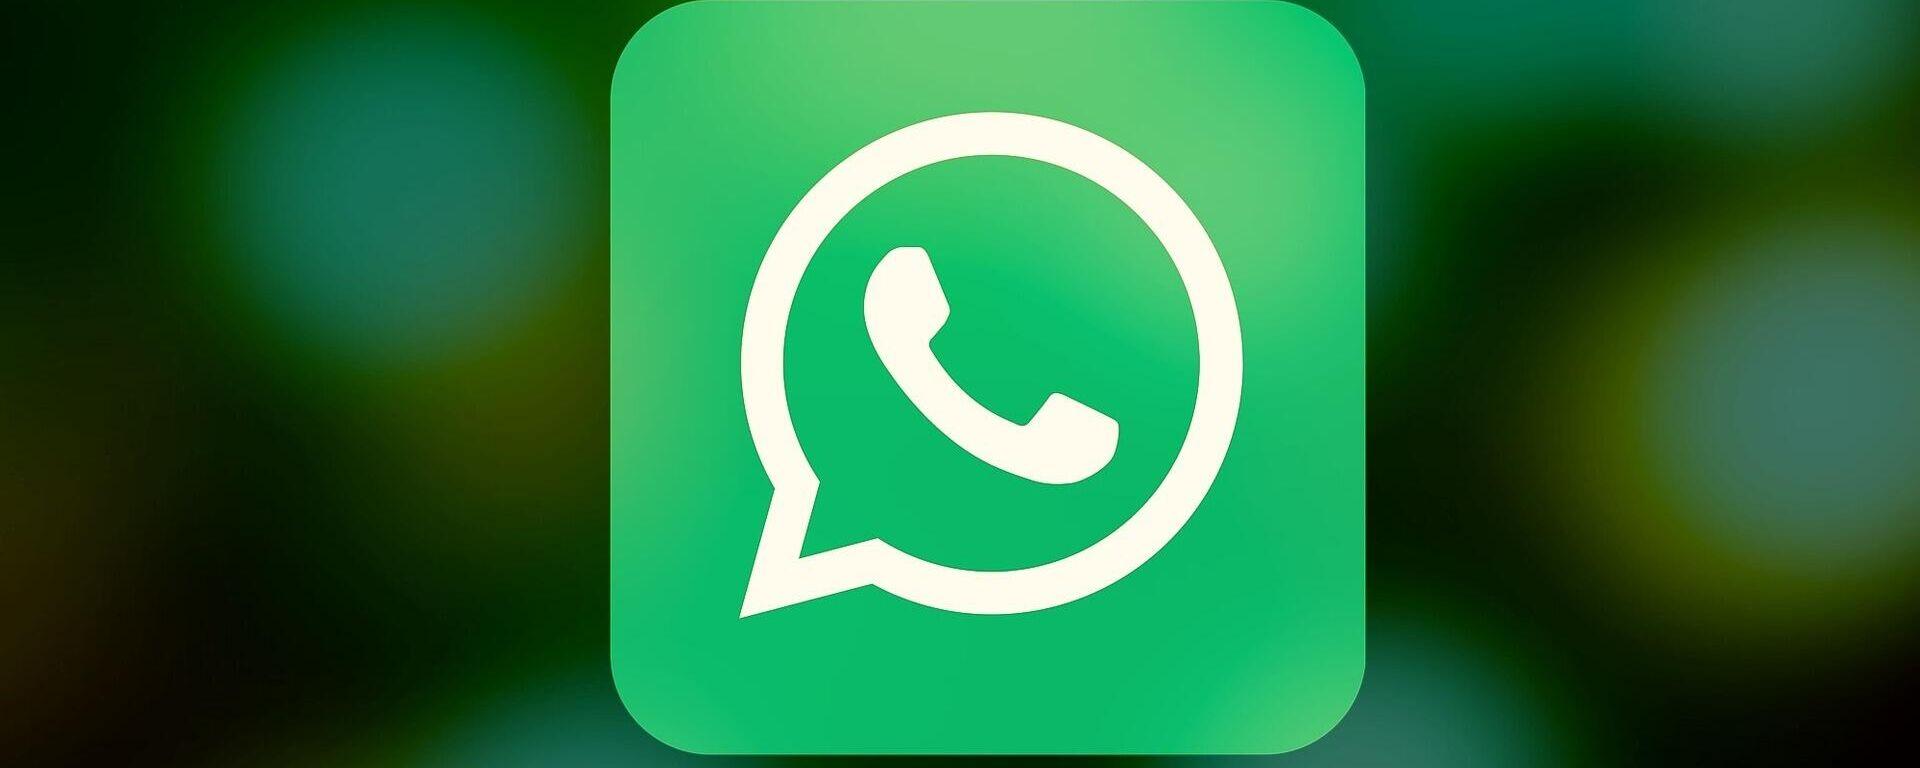 WhatsApp - Sputnik Mundo, 1920, 08.09.2021